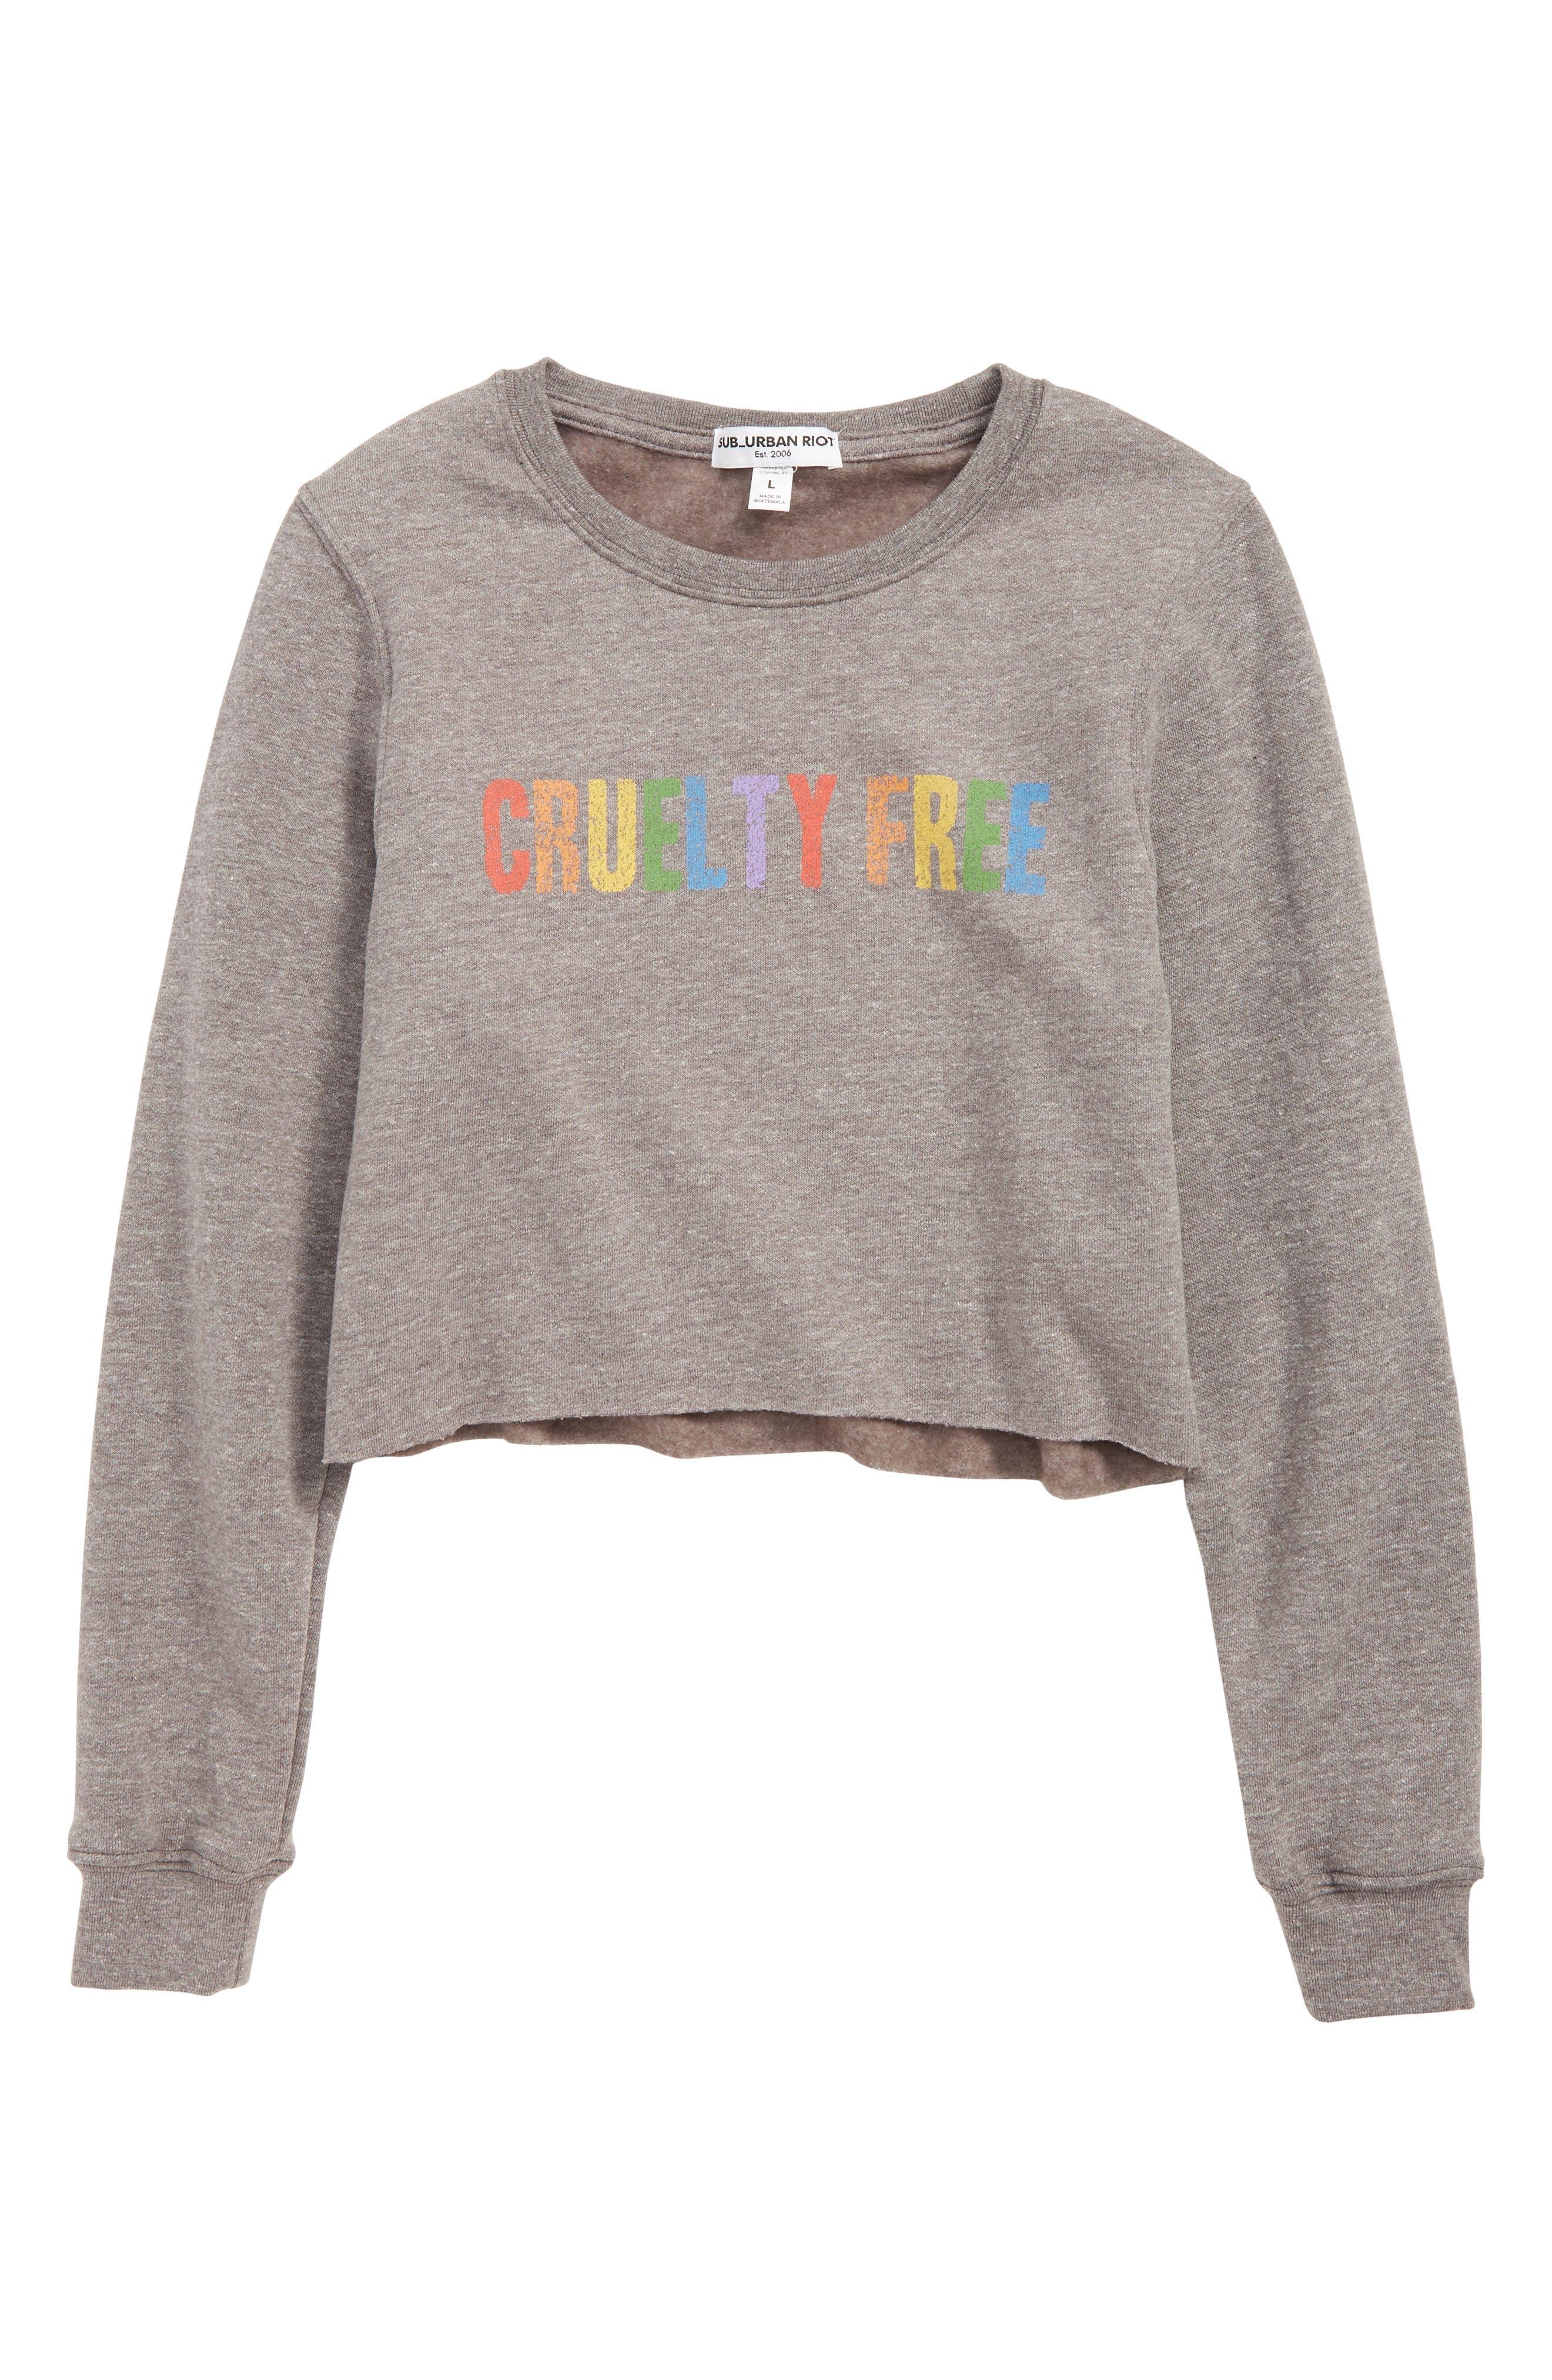 SUB_URBAN RIOT,                             Free Graphic Crop Sweatshirt,                             Main thumbnail 1, color,                             HEATHER GRAY